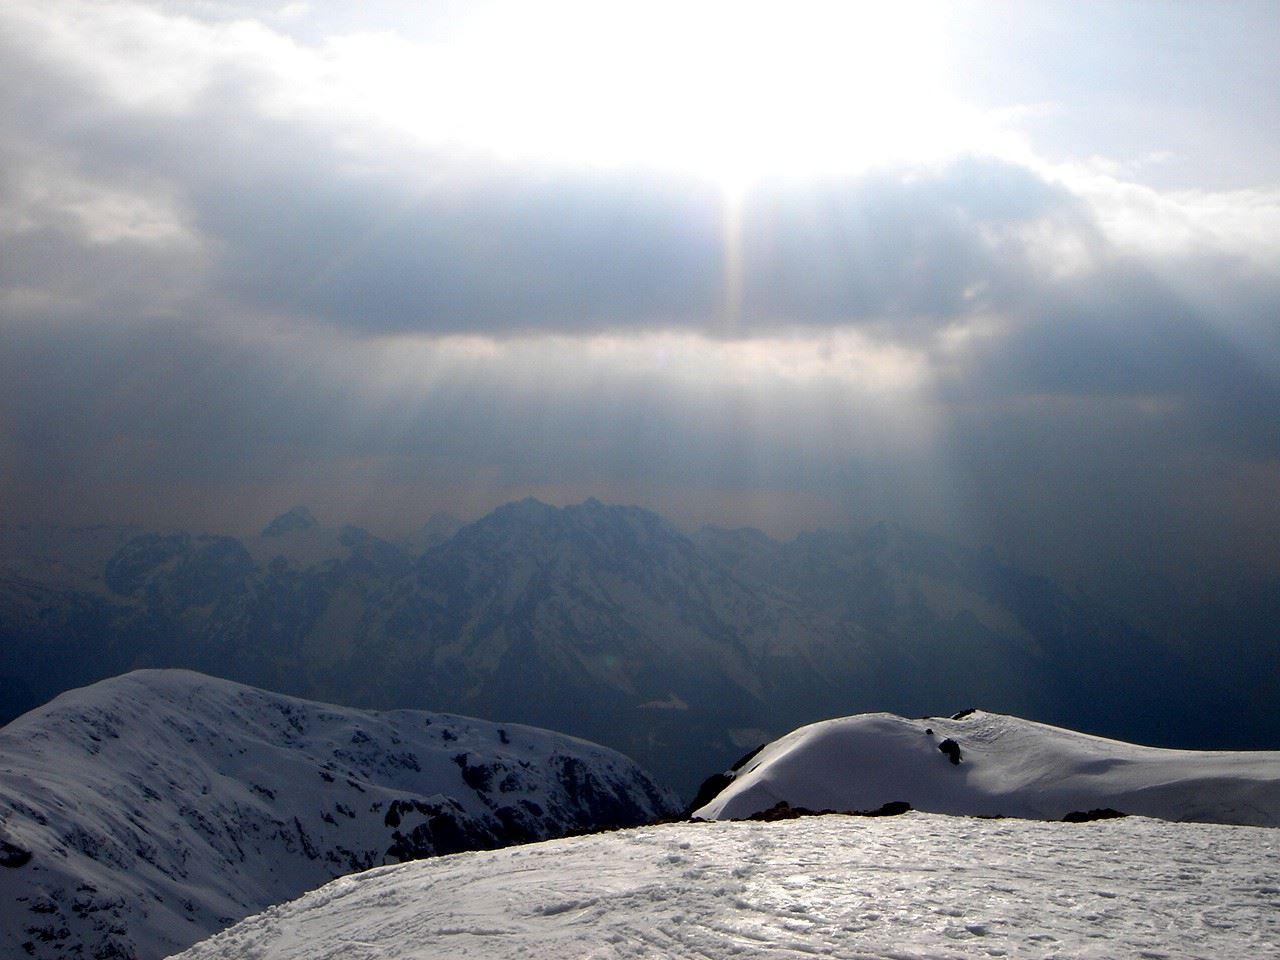 Foto: Manfred Karl / Ski Tour / Hoher Göll, 2522m / Hundstod - Watzmann - Hochkalter / 18.05.2007 06:38:54